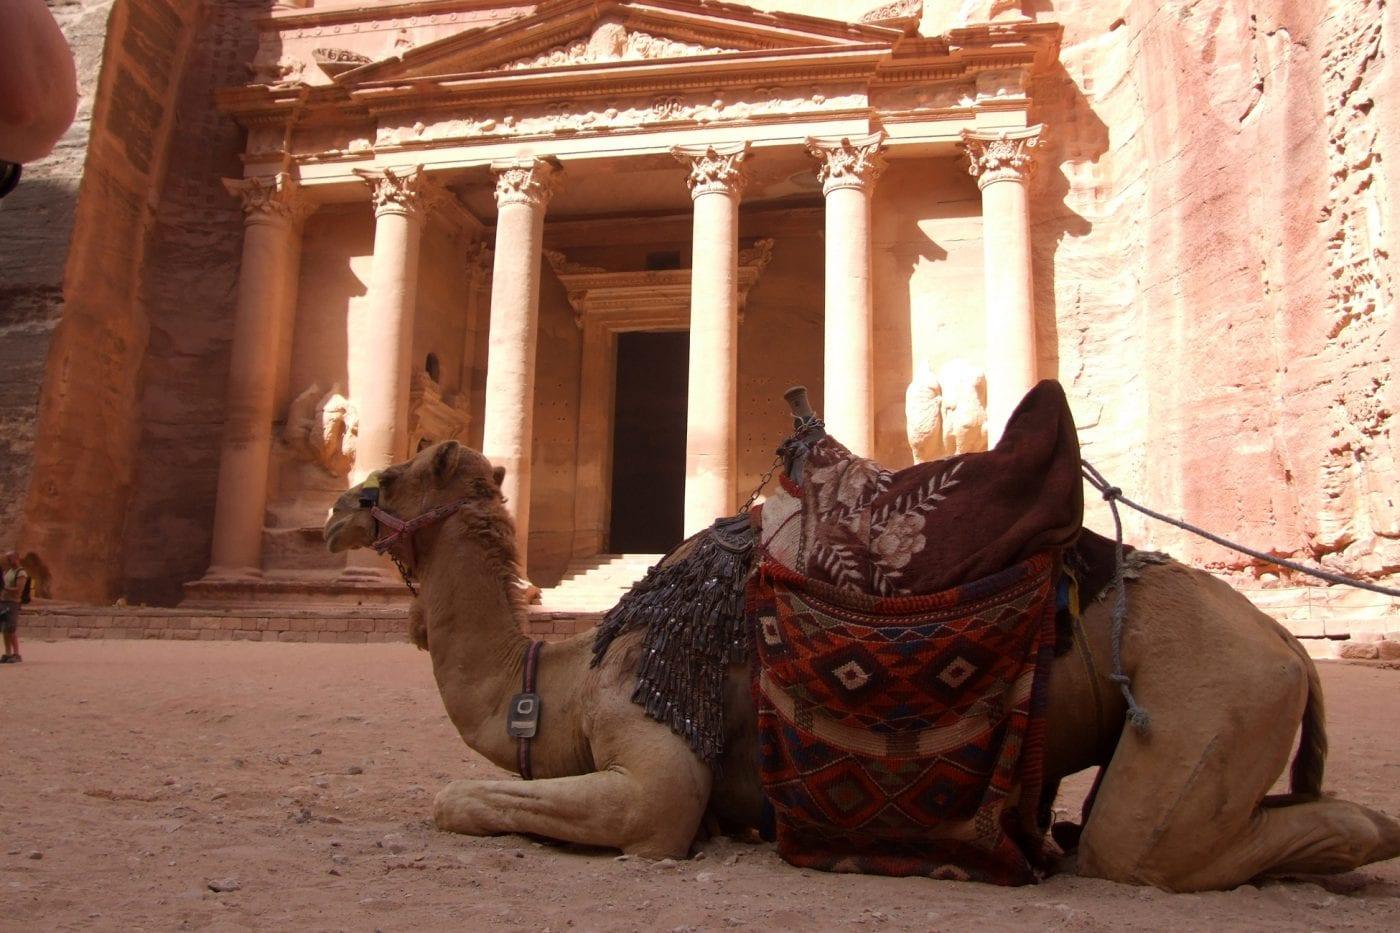 petra camel outside the treasury